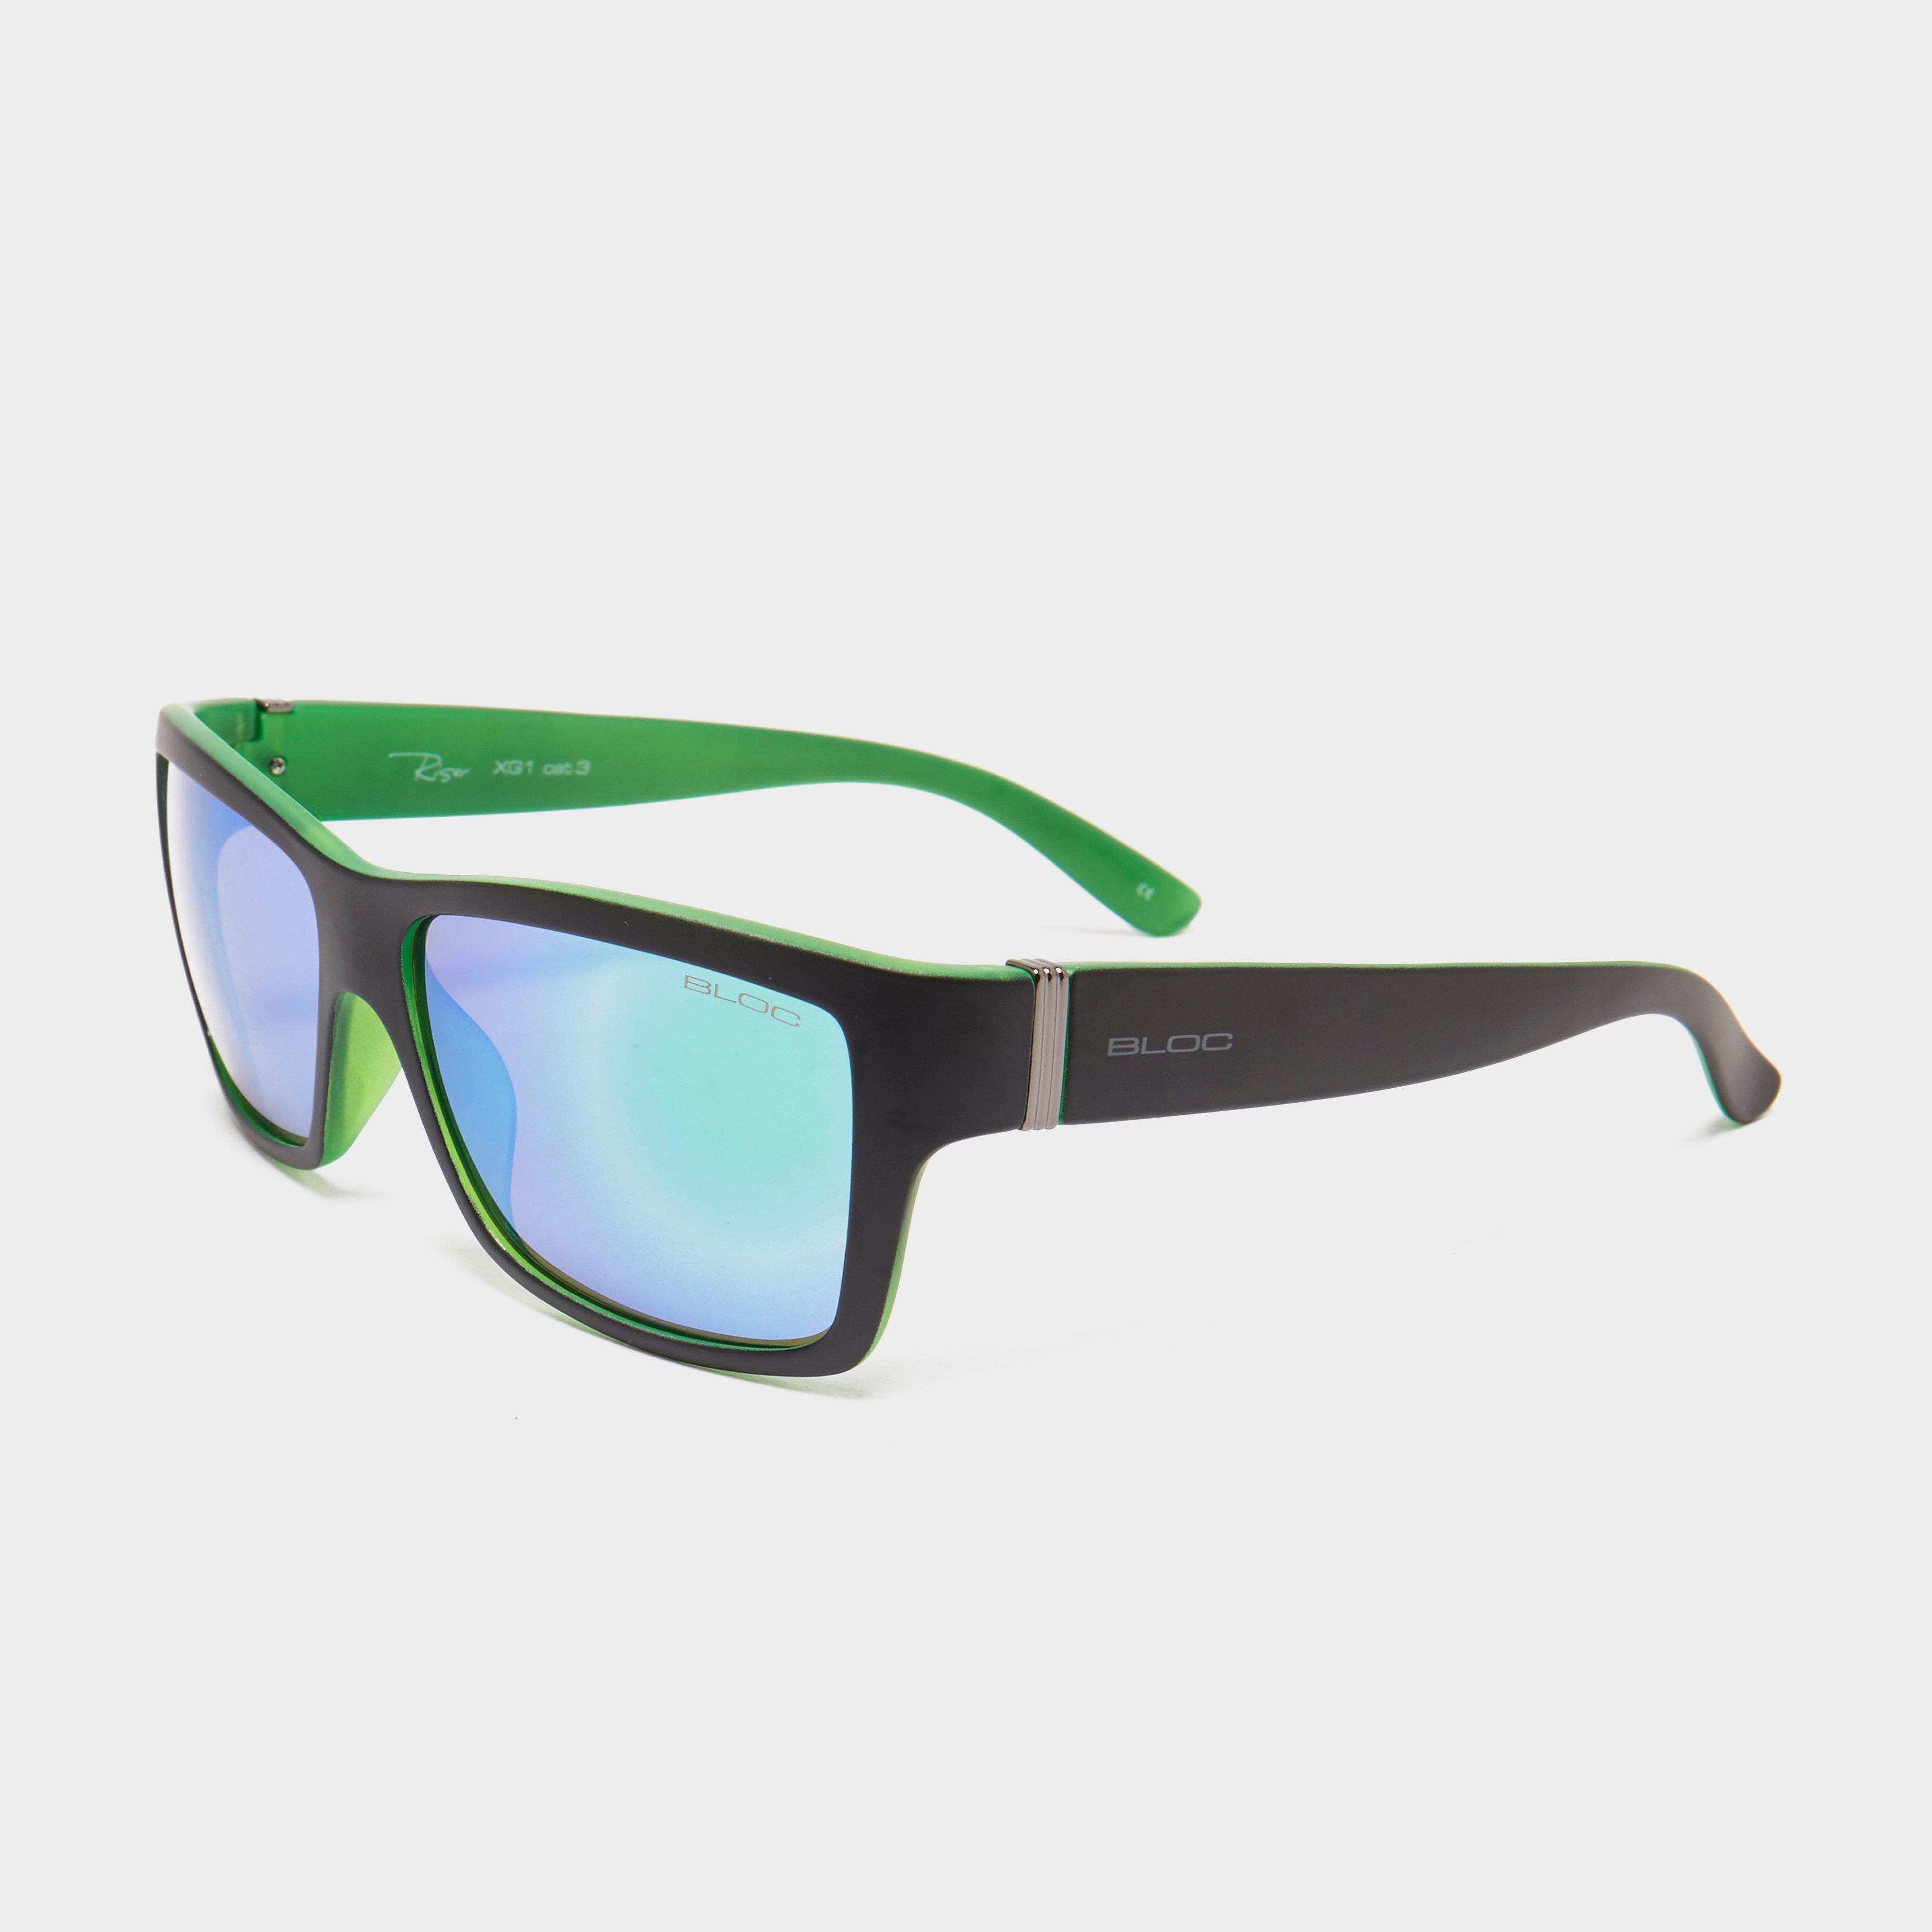 Bloc Men's Riser Sunglasses - Black/Blk/Grn, Black/Green